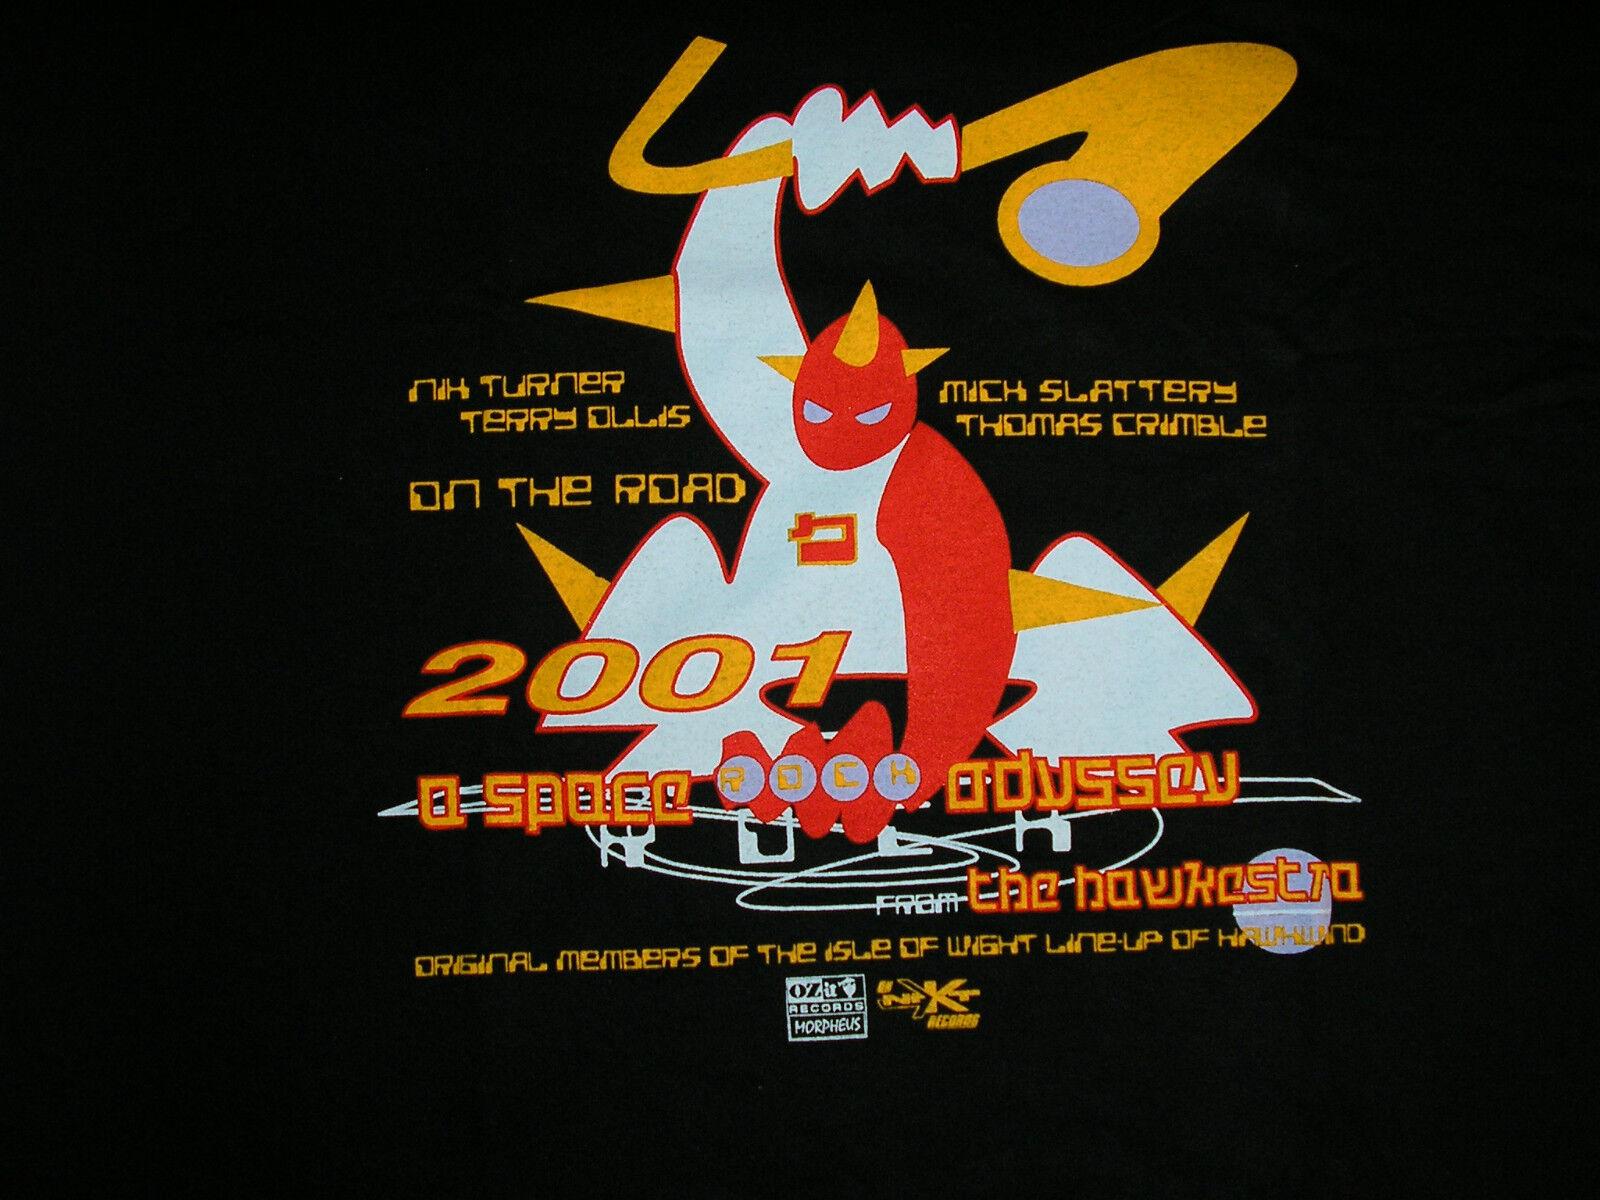 Hawkwind Hawkestra Nik Turner Crew T shirt 2001 to 2003 unopened unworn